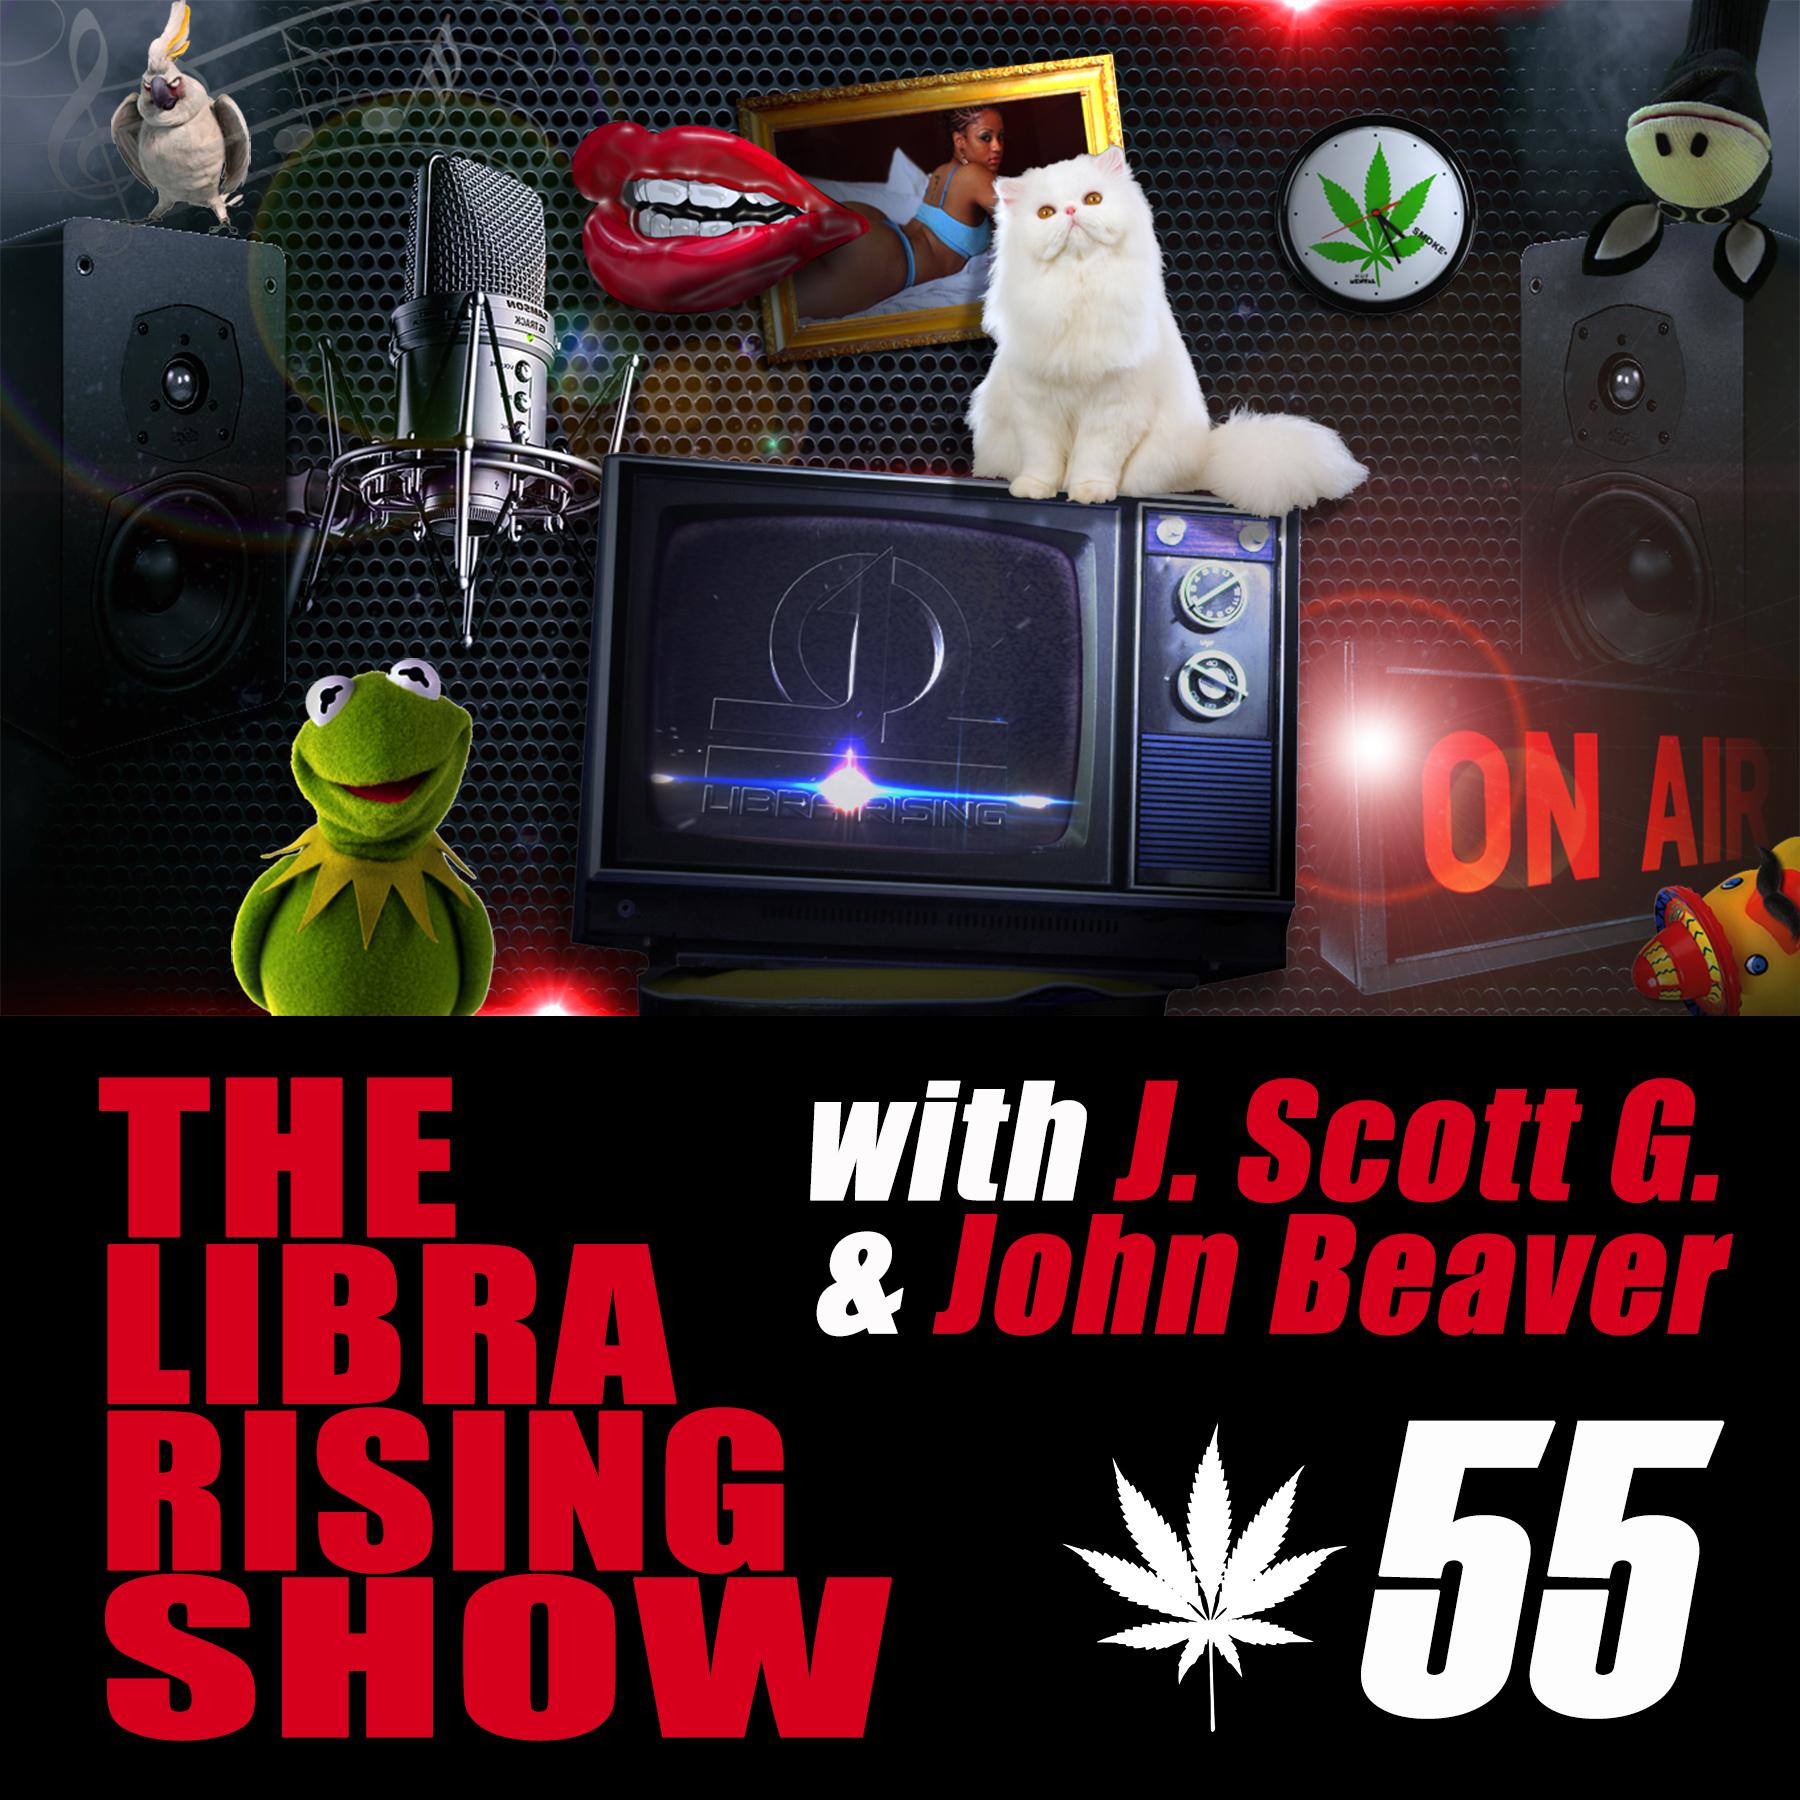 The Libra Rising Show – Episode 55